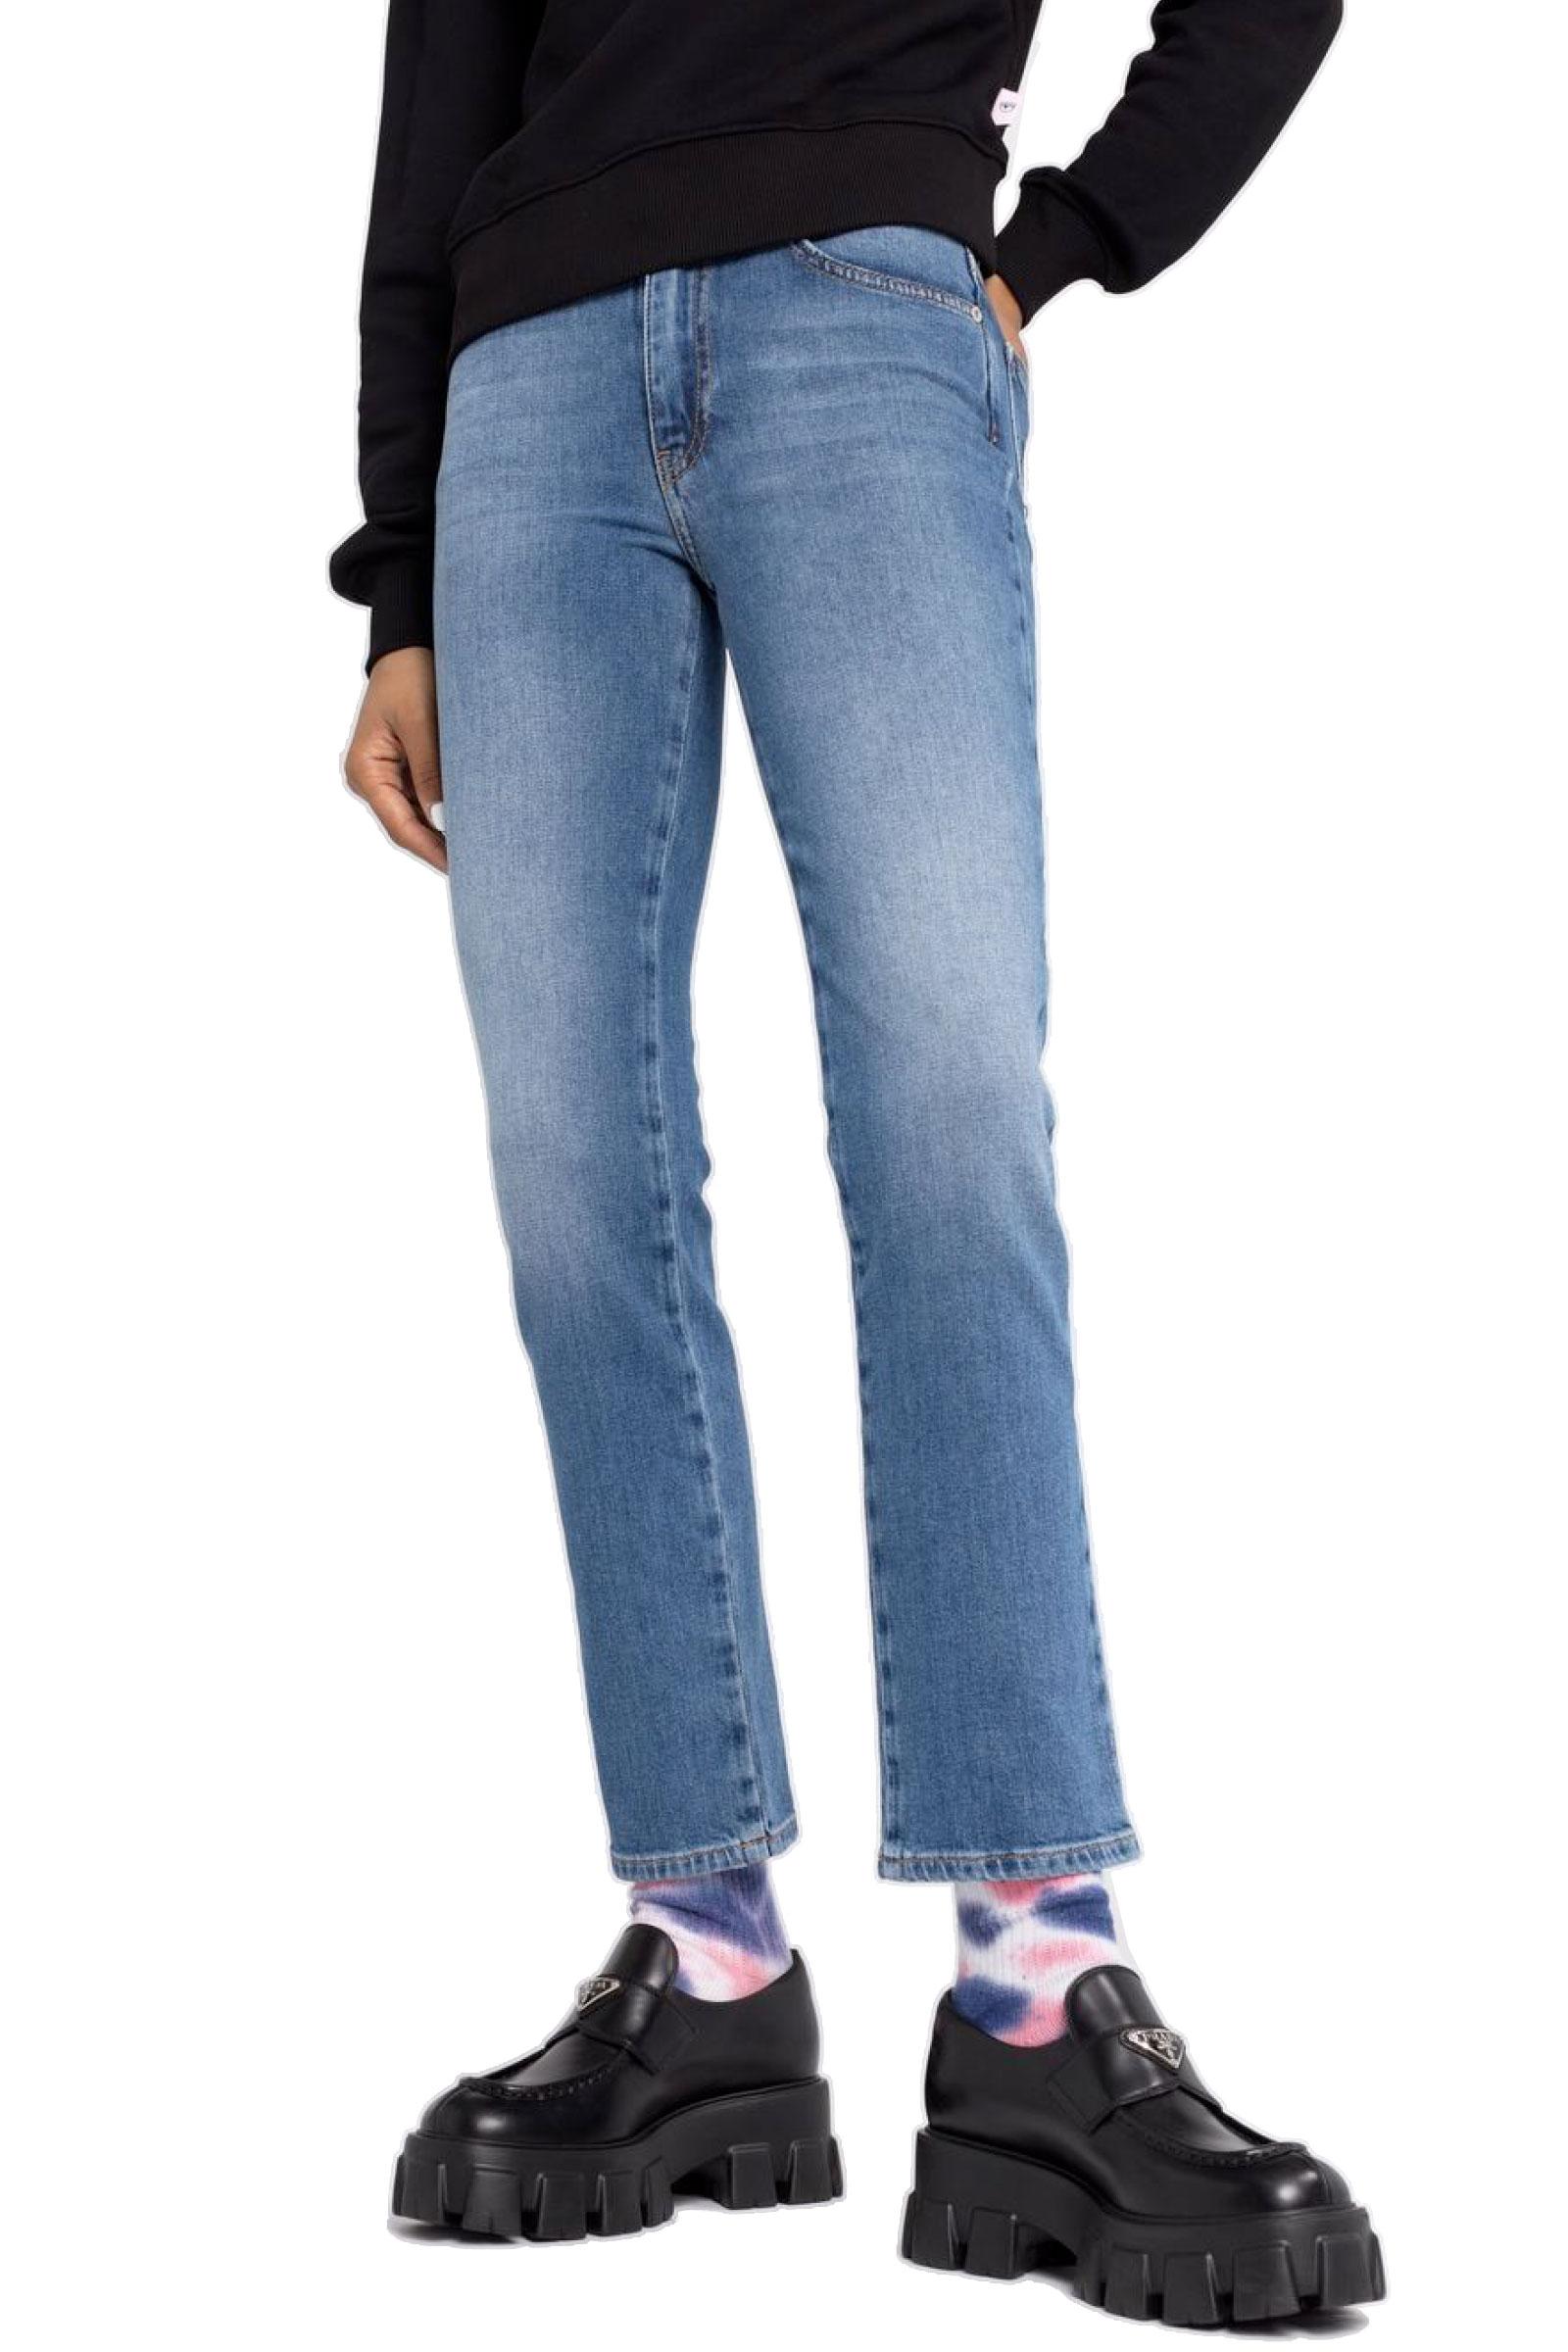 CHIARA FERRAGNI | Jeans | 71CBB5R3 CDW13904